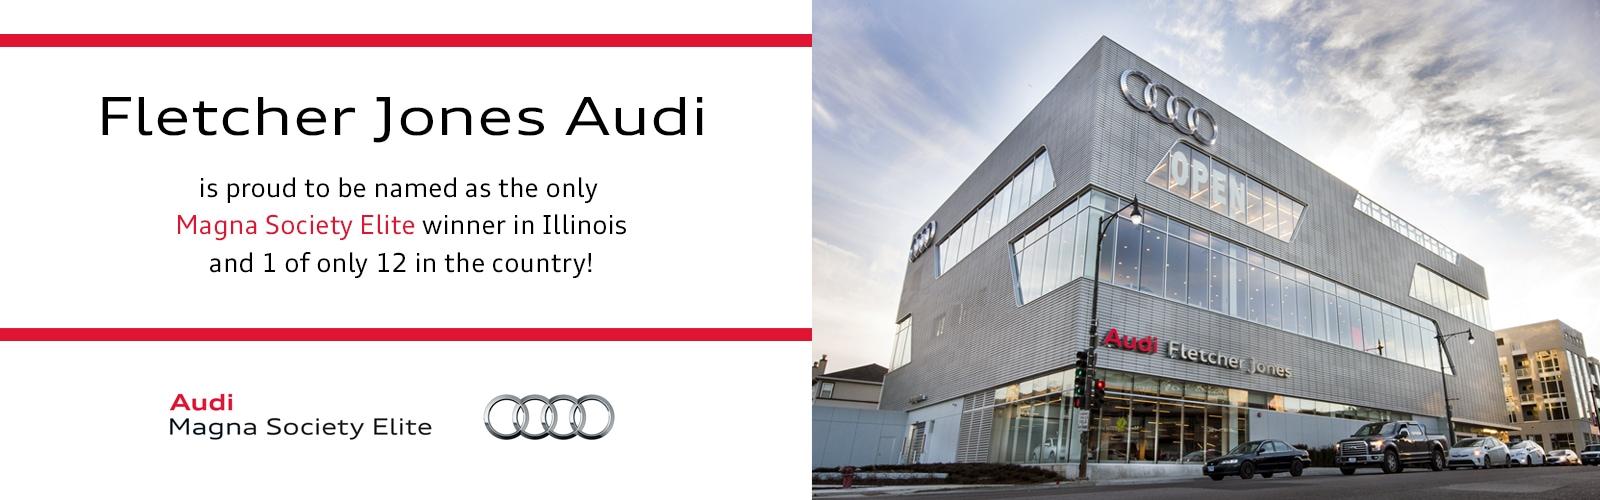 New Used Audi Dealership In Chicago IL At Fletcher Jones Audi - Audi dealers illinois